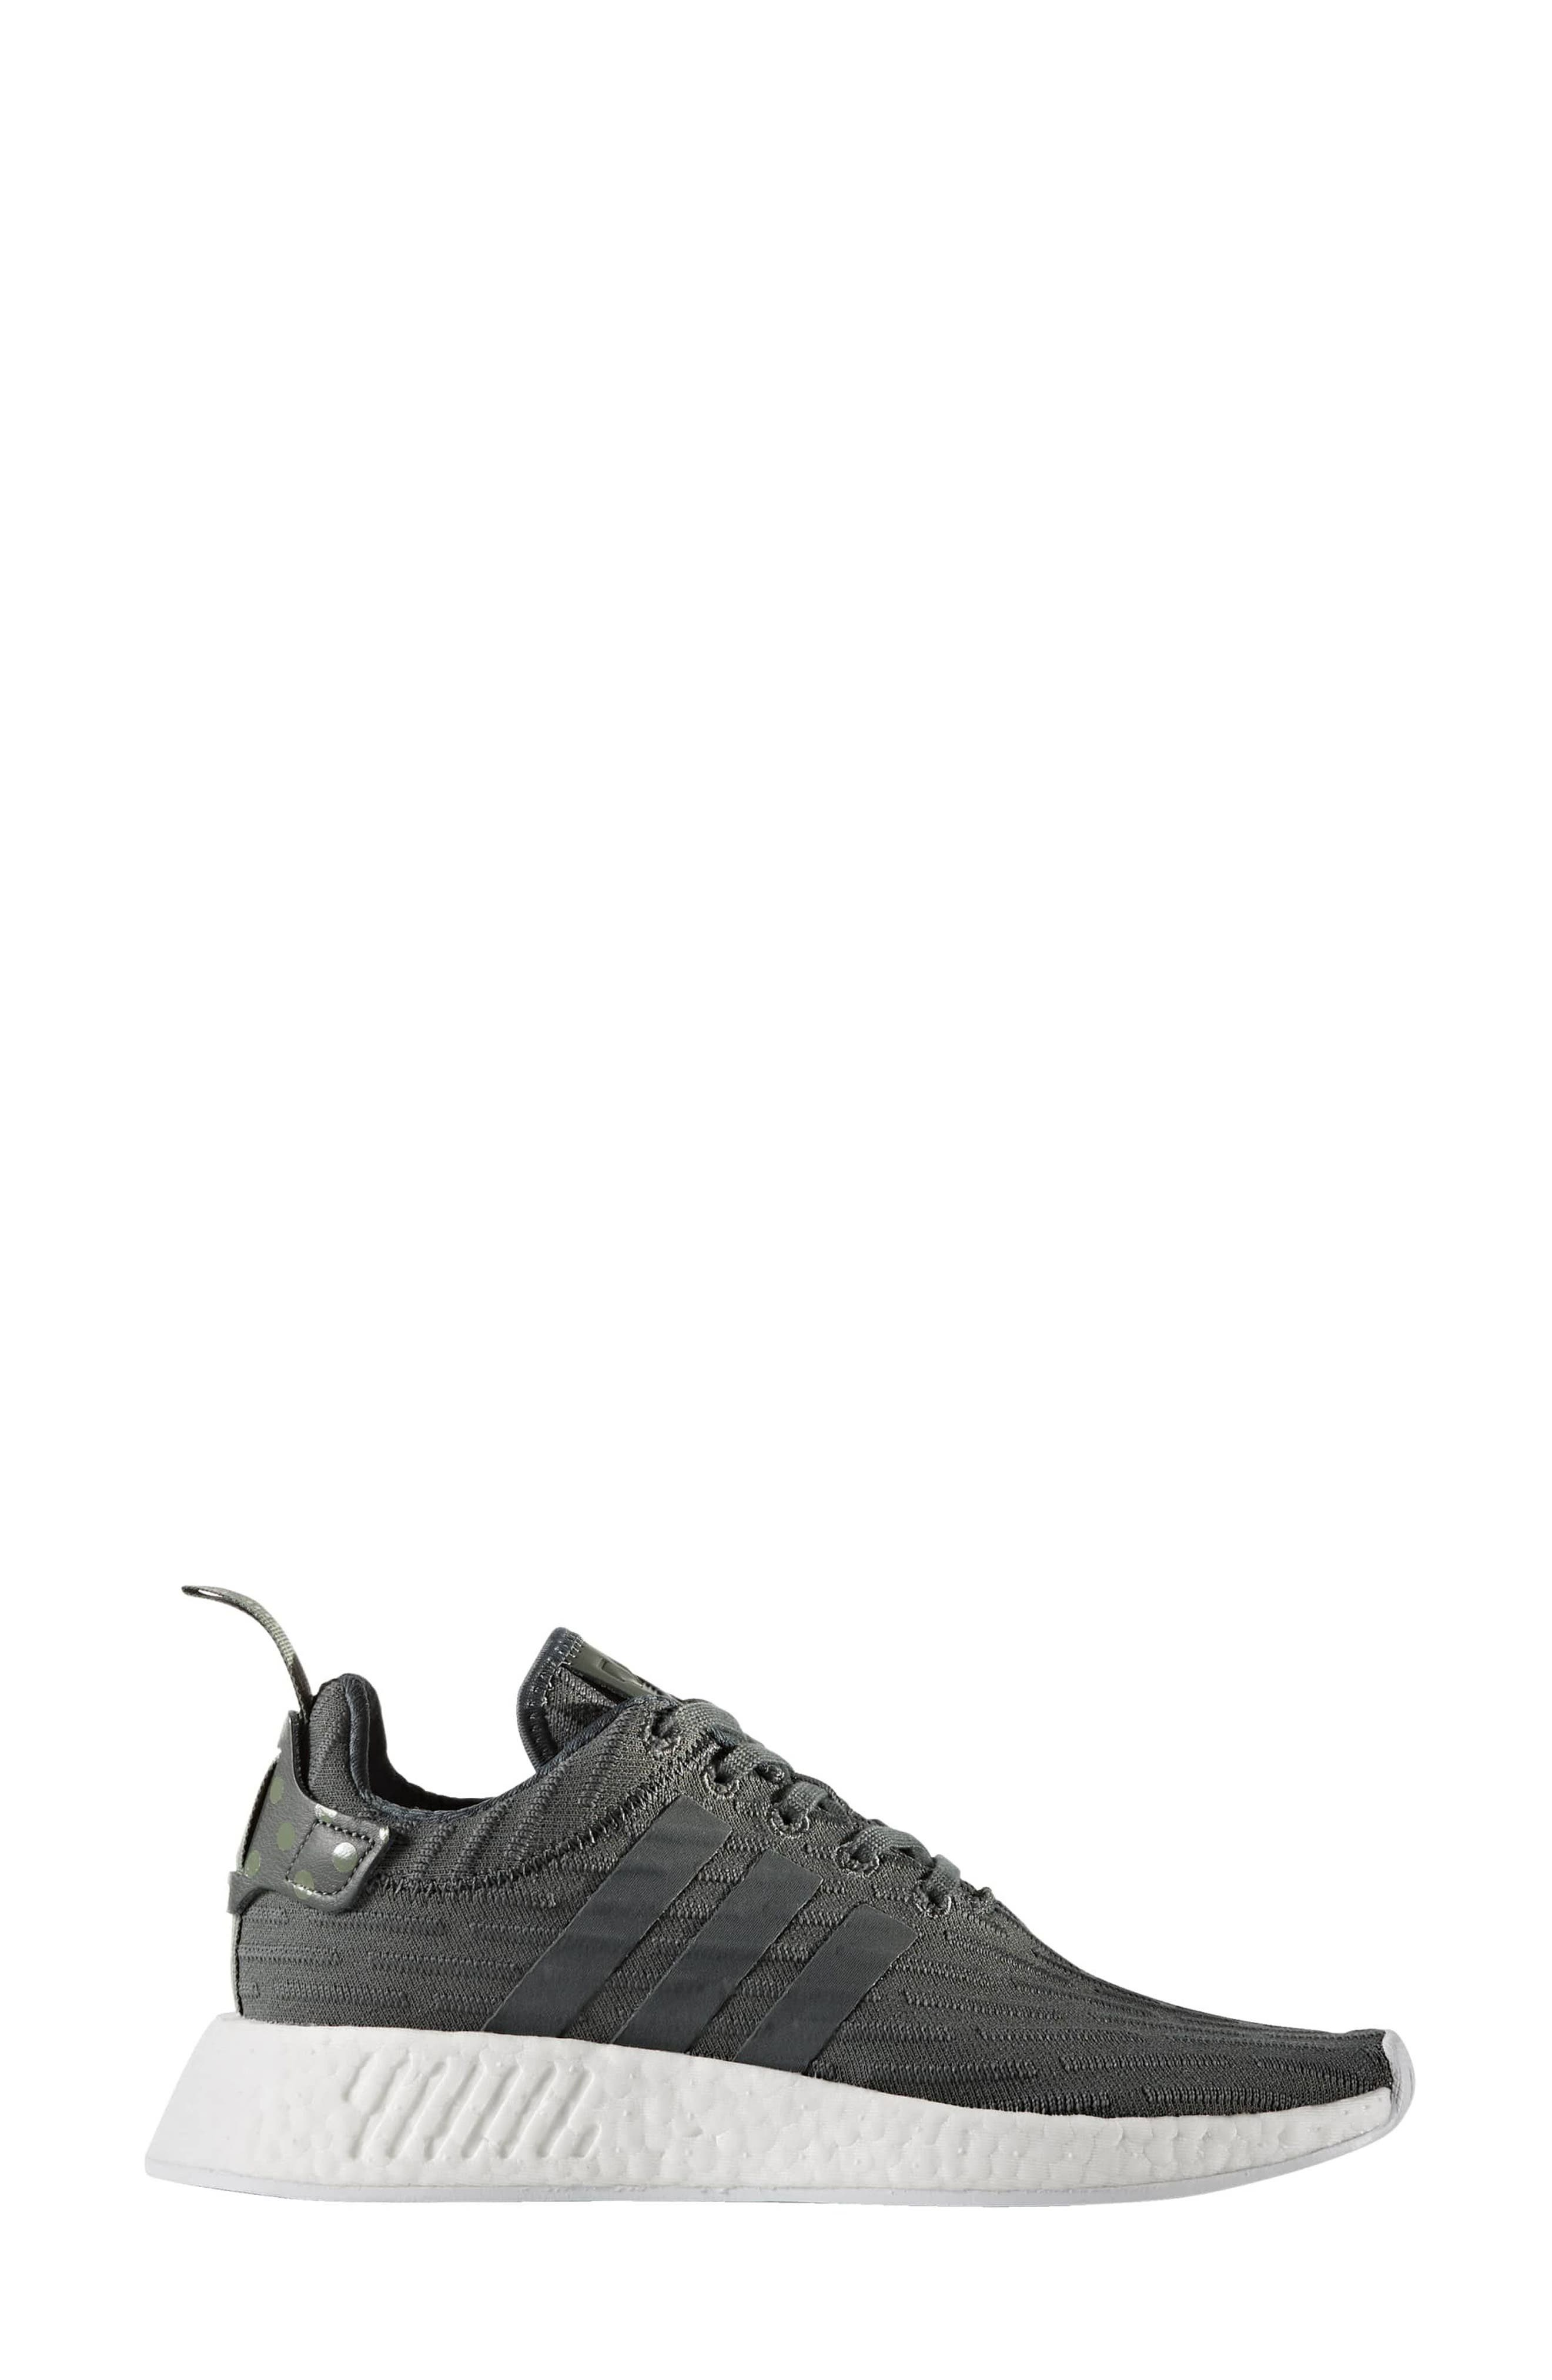 5b5db7a037786 Adidas Originals Nmd R2 Running Shoe In Ivy  White  Green